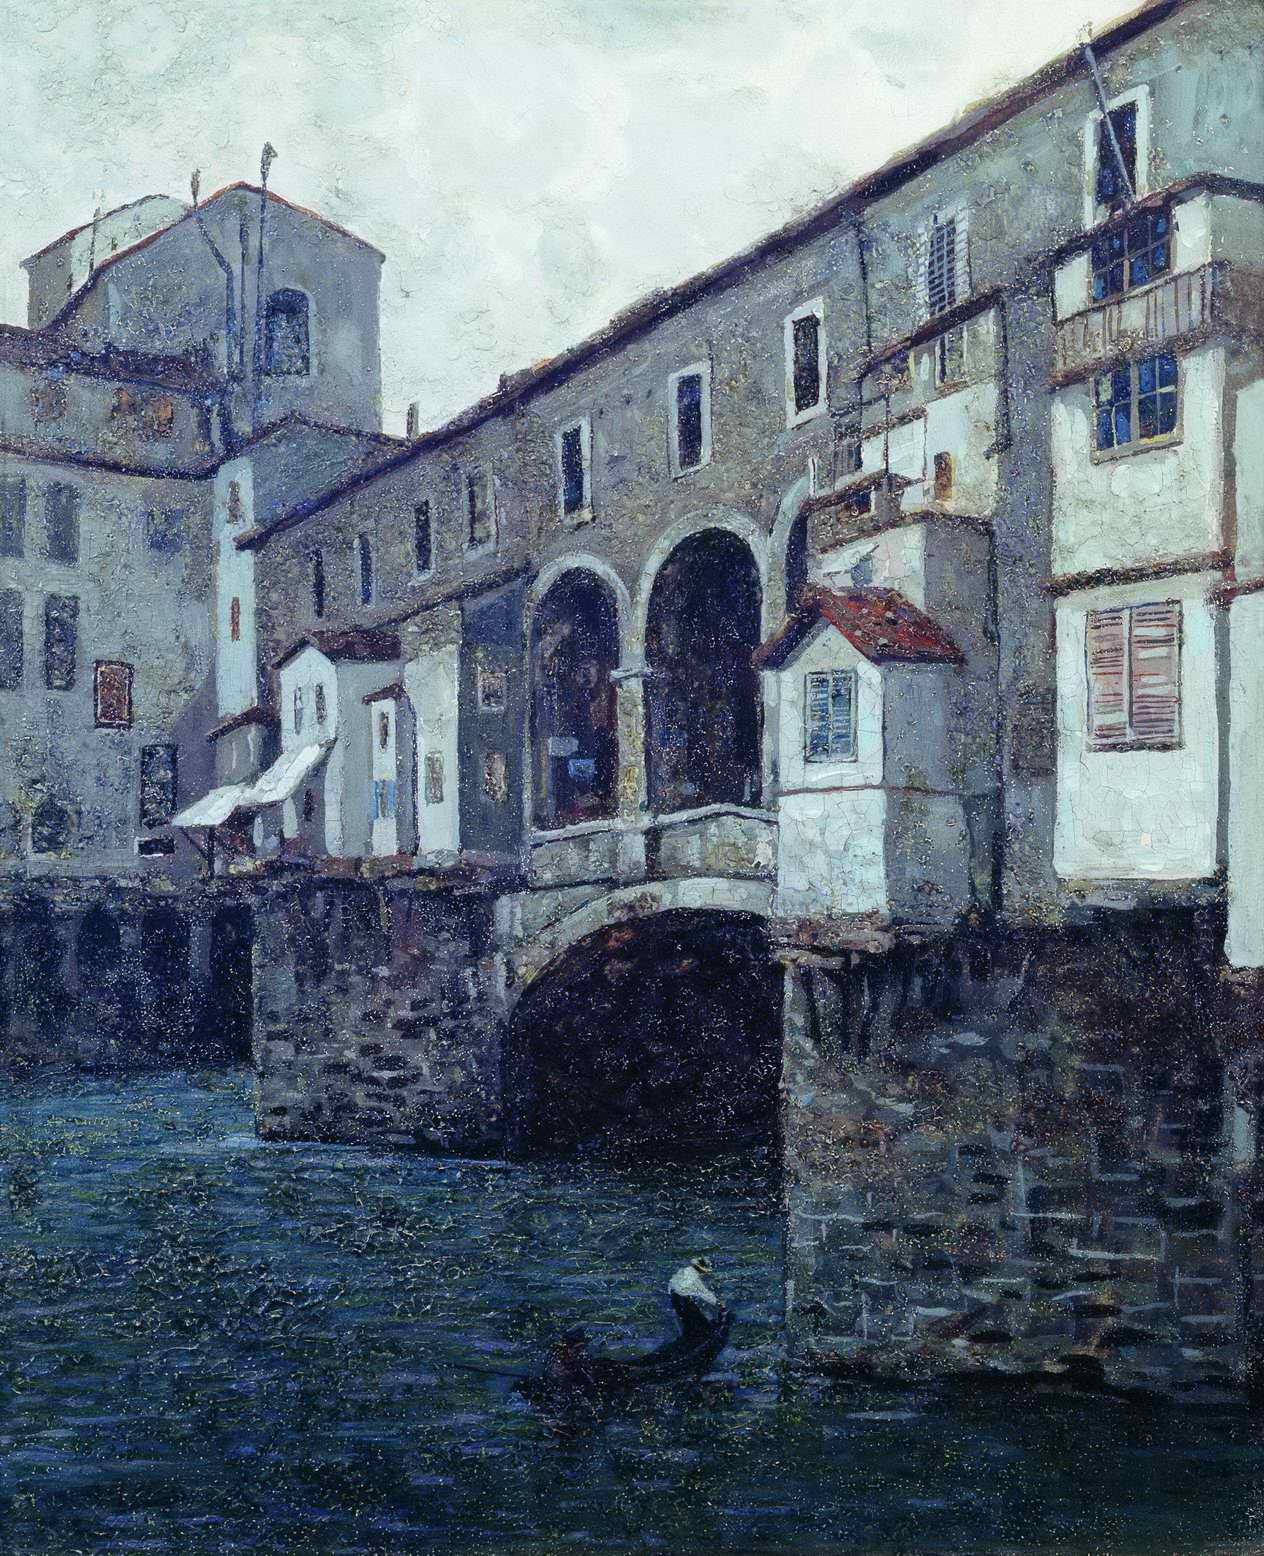 Зарубин В.И. - Старый мост. Венеция